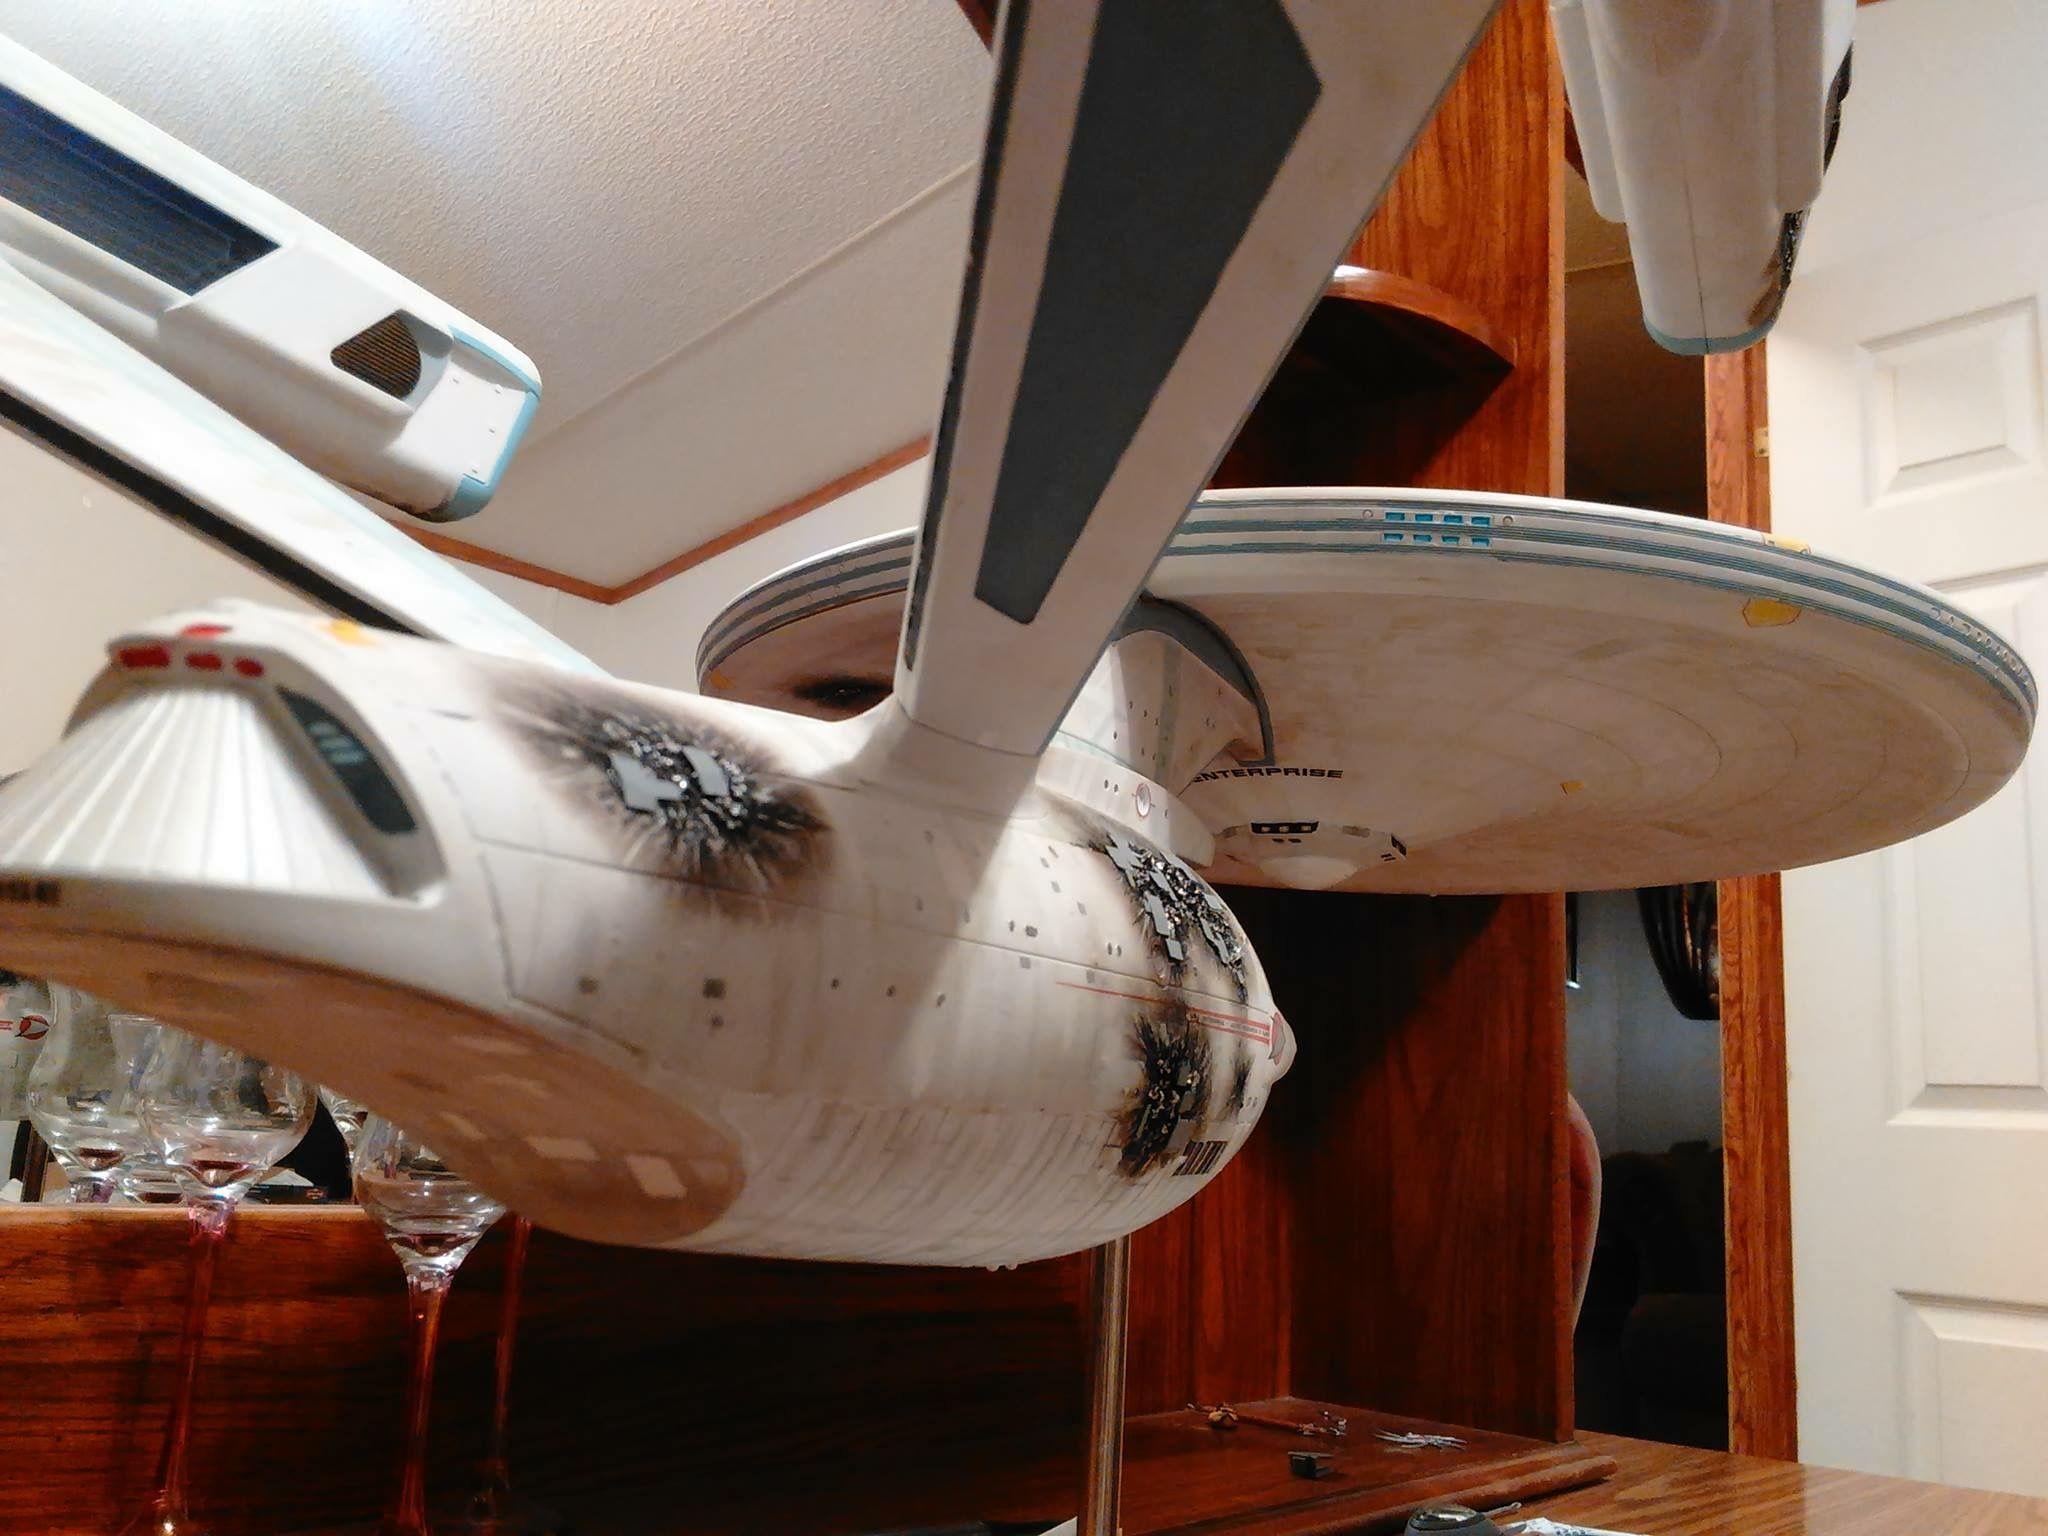 Star trek uss enterprise ncc refit 1 scale model - 1 350 Scale Polar Lights Uss Enterprise Refit Model Battle Damage